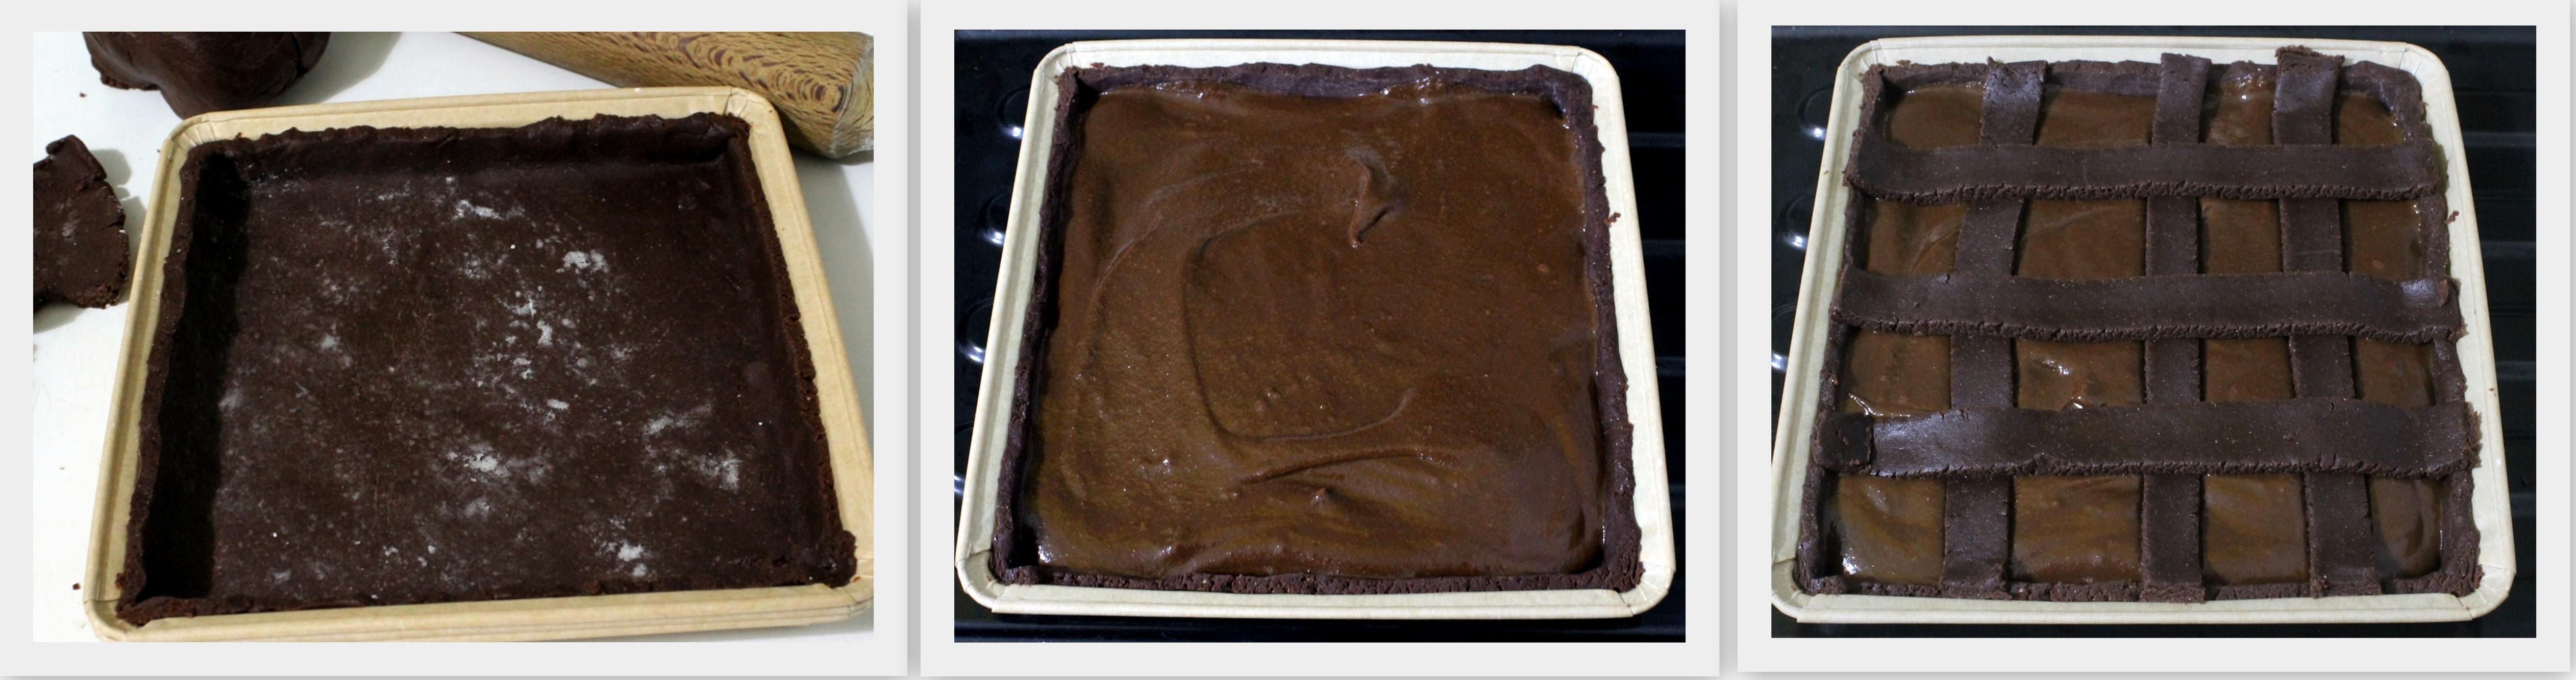 Tarte au chocolat de Knam sans gluten